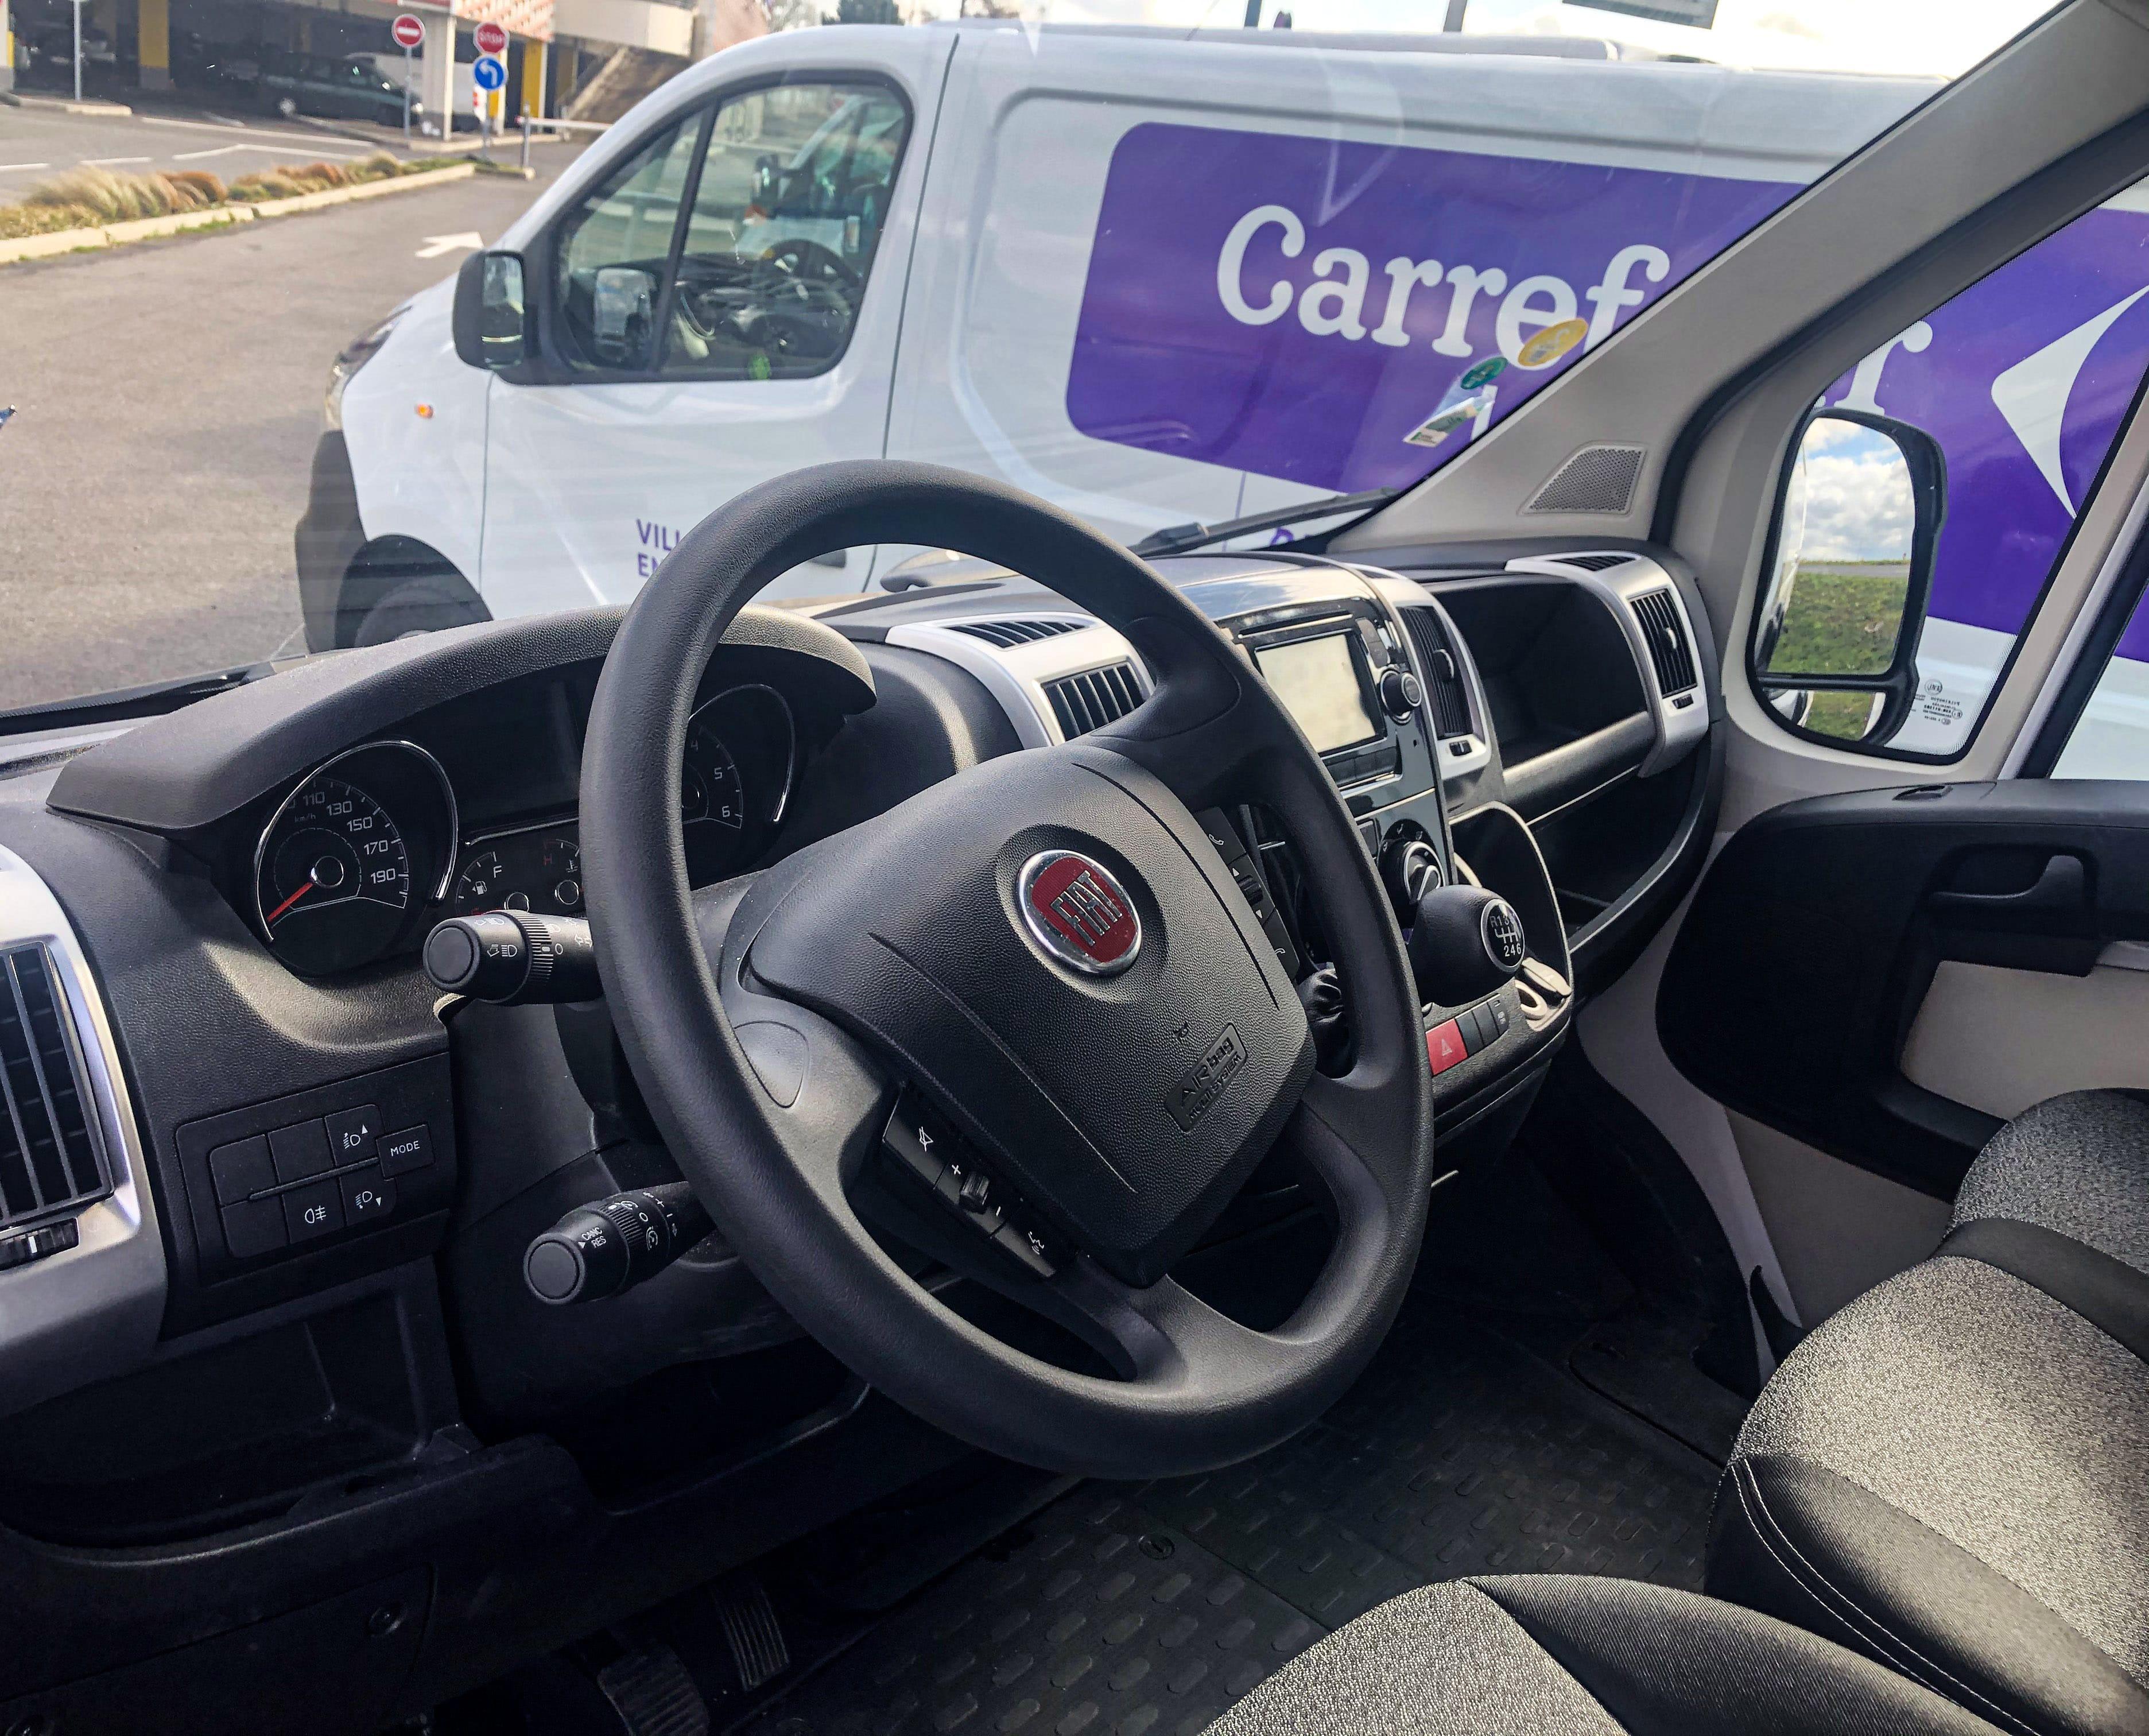 Carrefour Location Cambrai